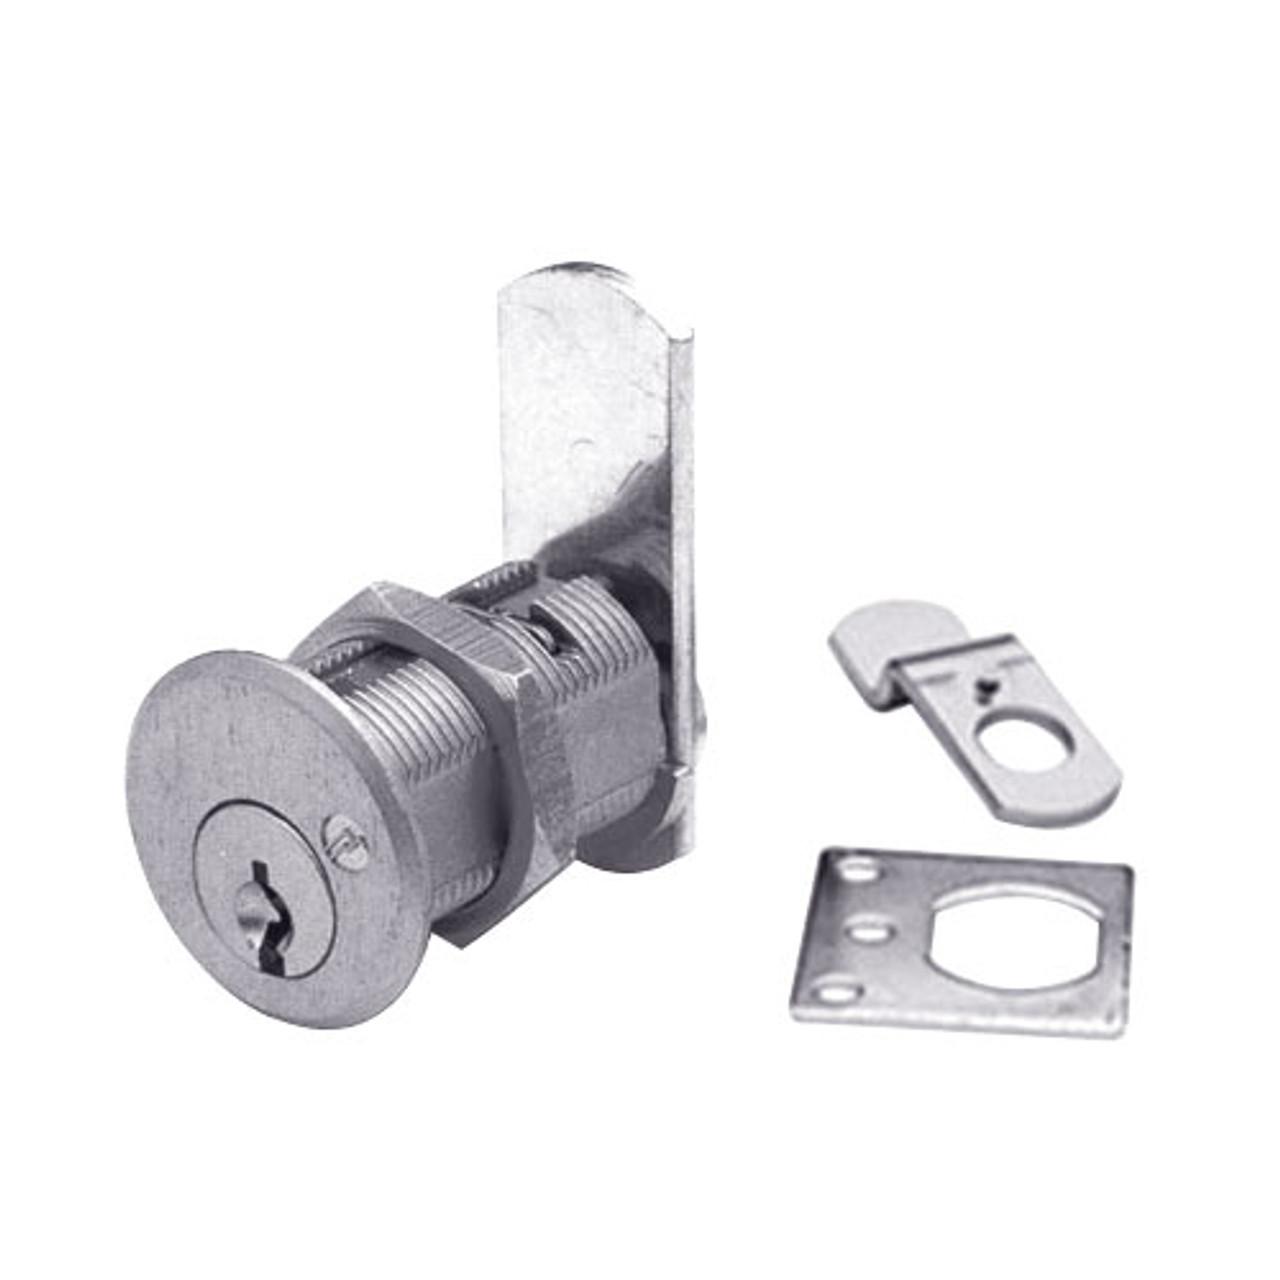 Olympus DCN2-KA107-26D Cam Locks in Satin Chrome Finish